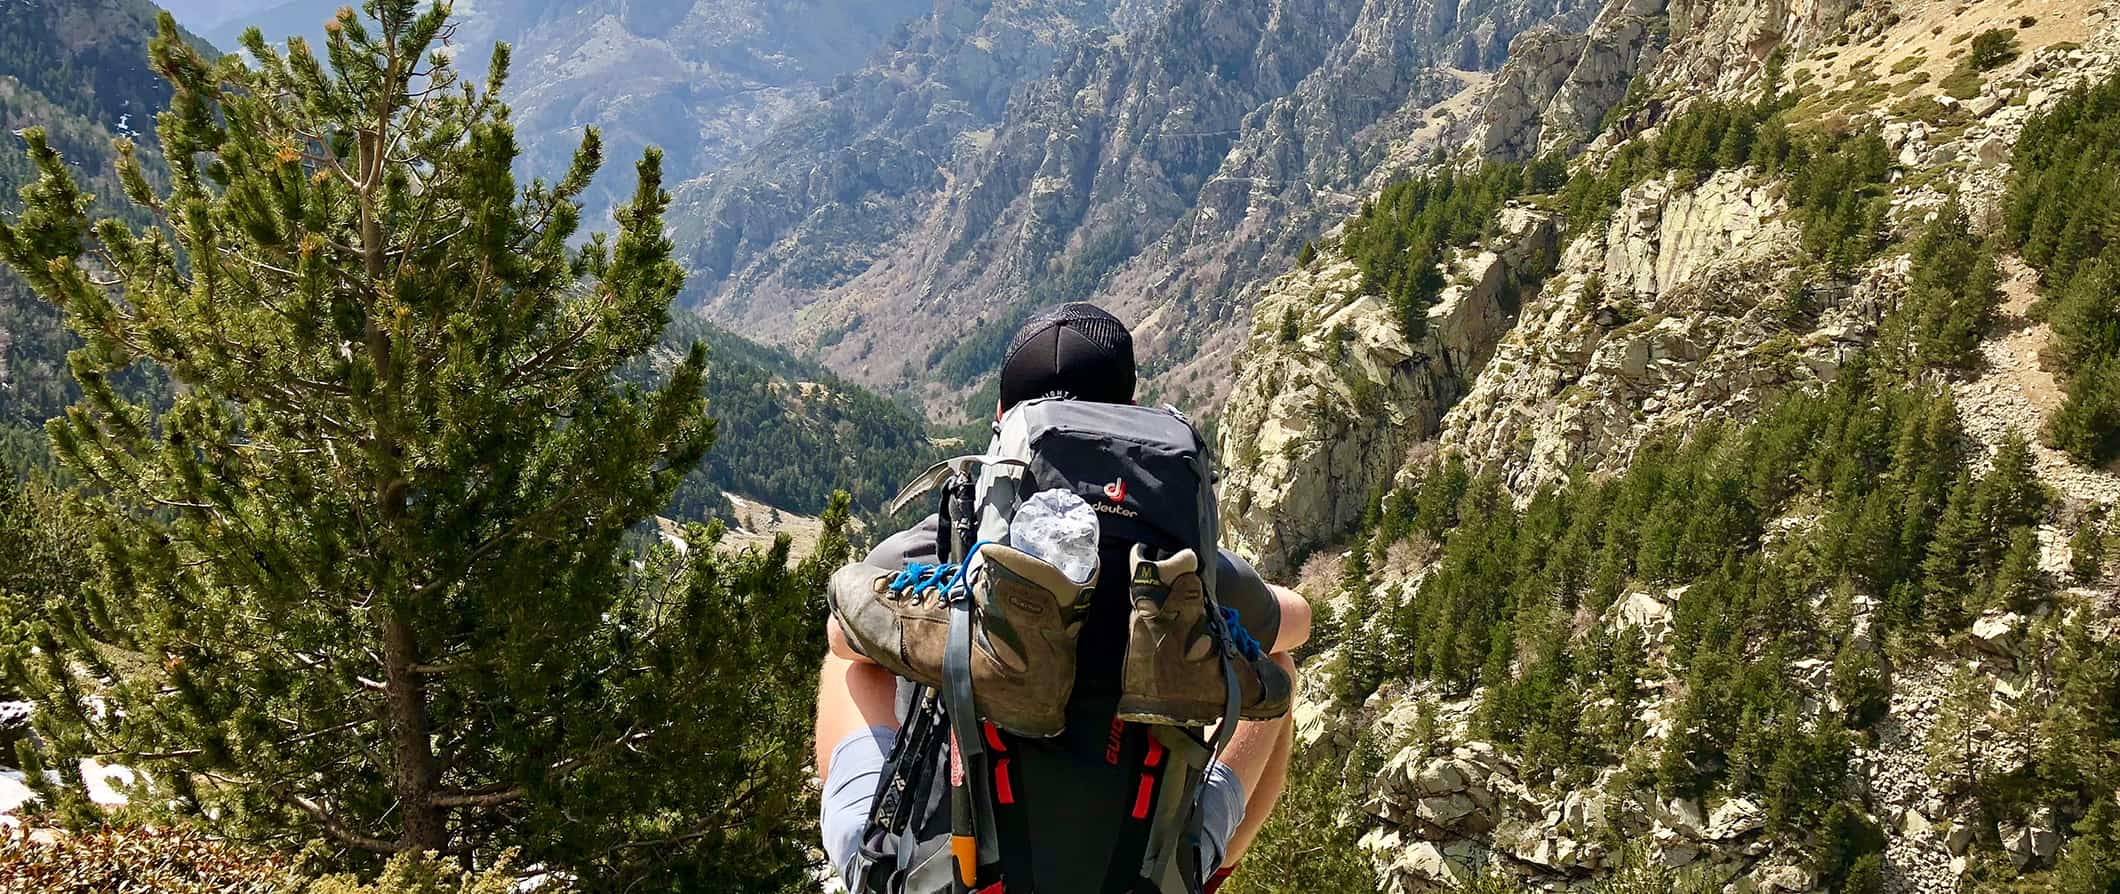 a man wearing hiking gear